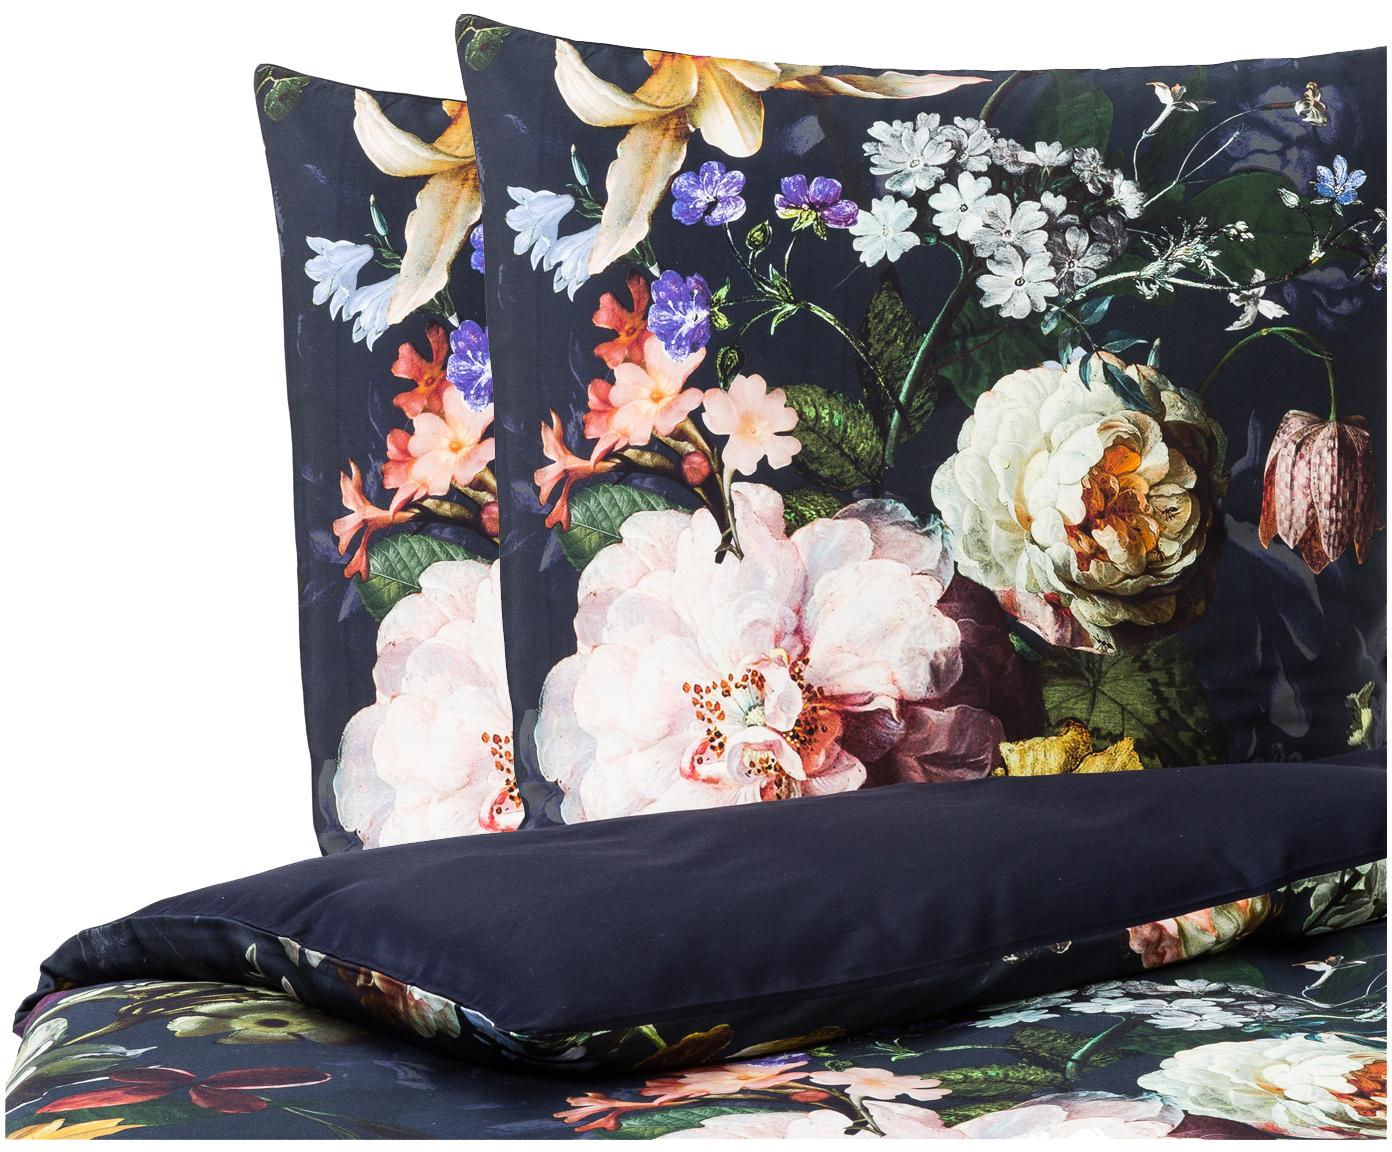 Katoenen dekbedovertrek Fleur, Donkerblauw, 240 x 220 cm